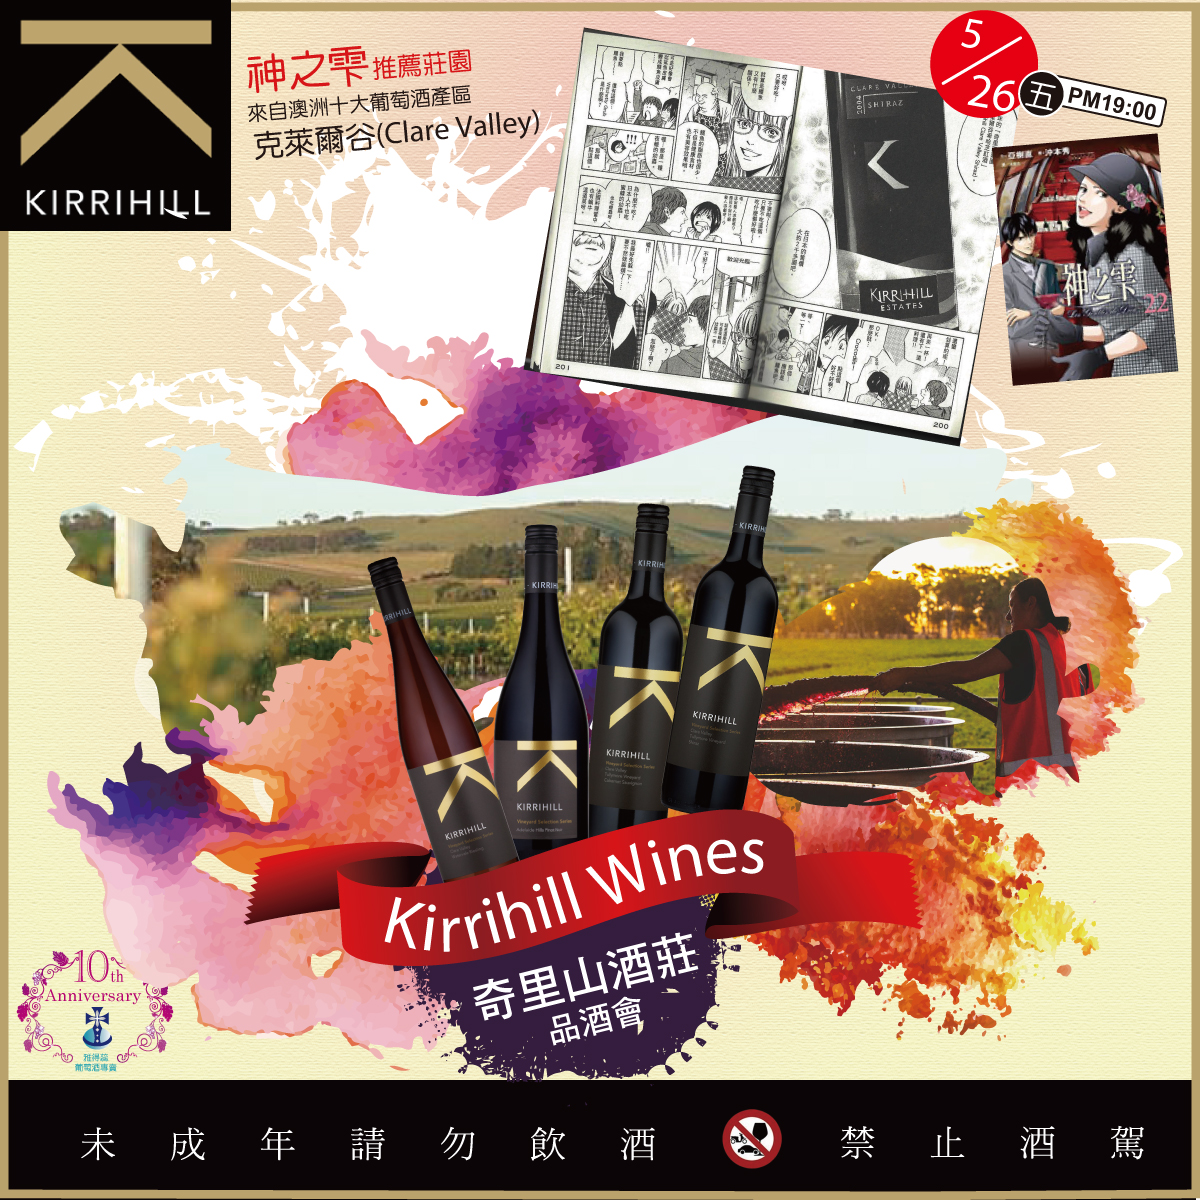 20170526-fb廣告_Kirrihill酒.jpg